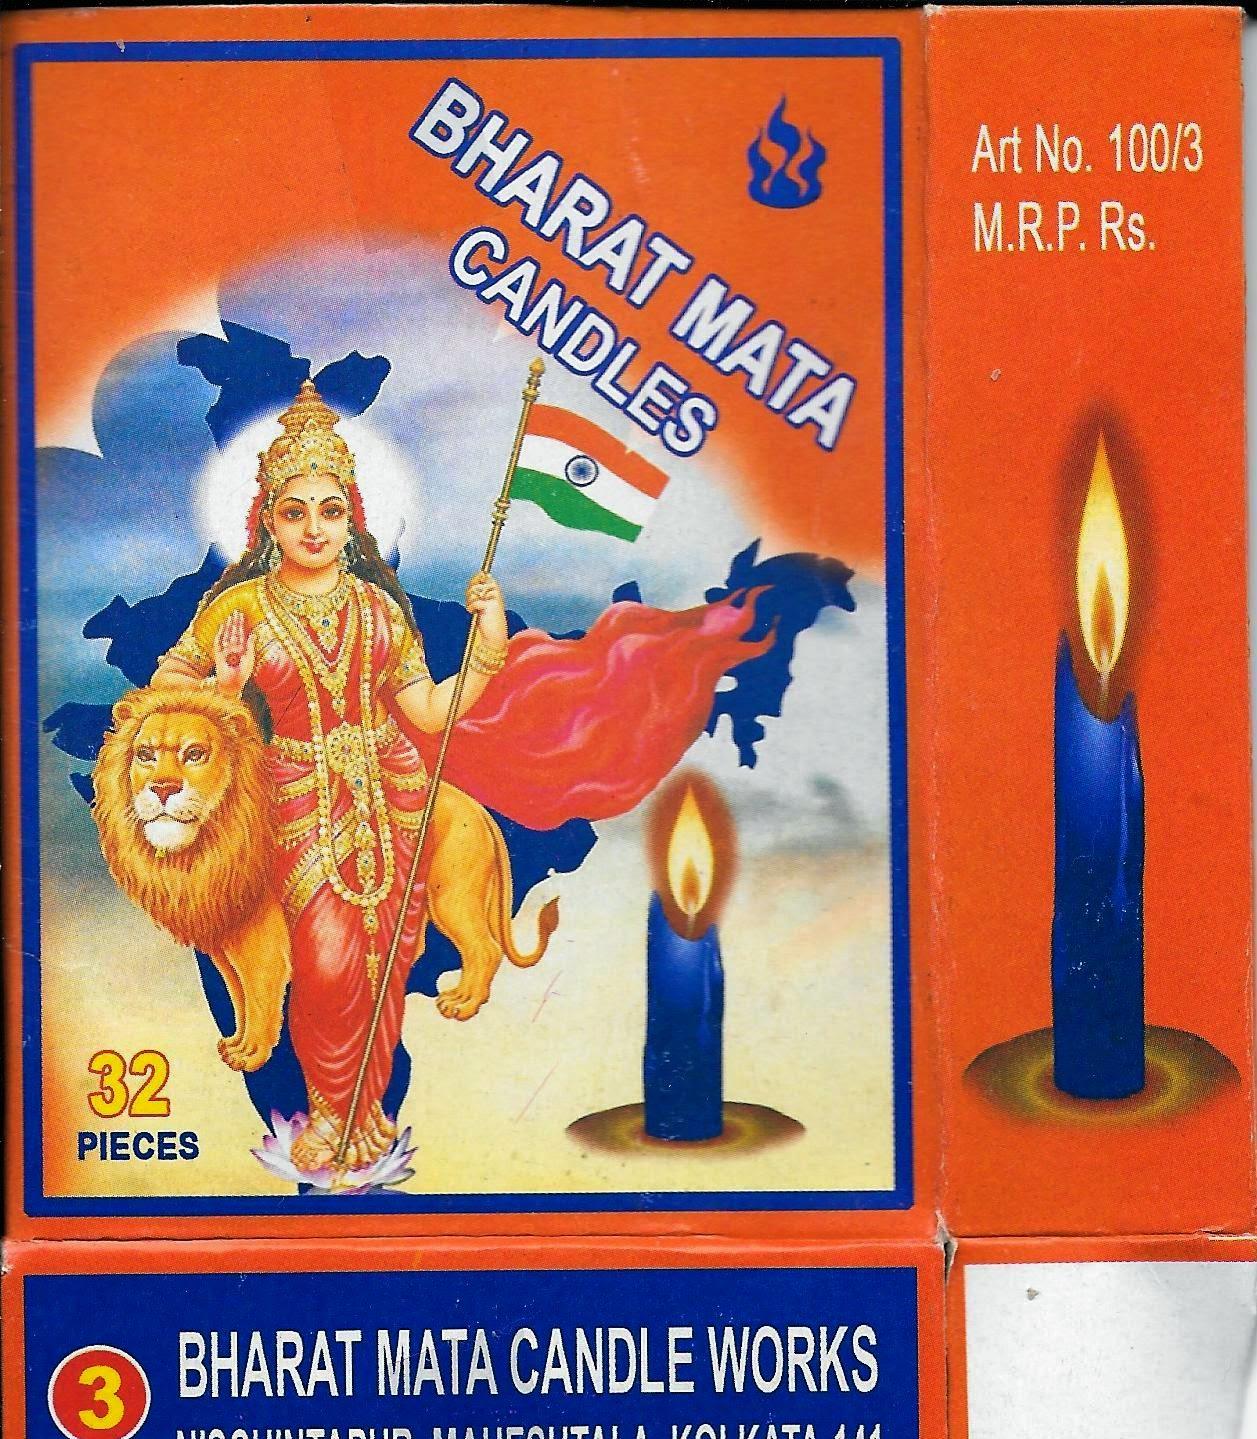 bharat mata with rss flag - photo #24